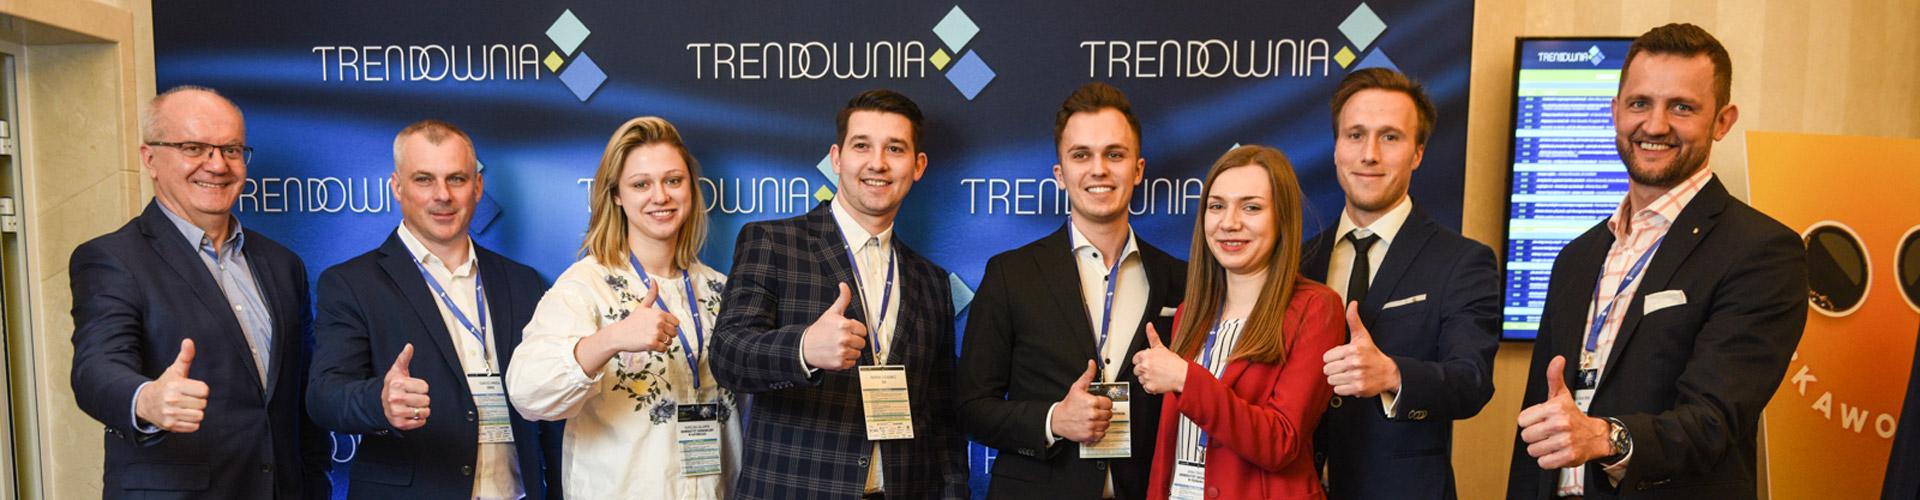 trendownia 2019 - relacja header